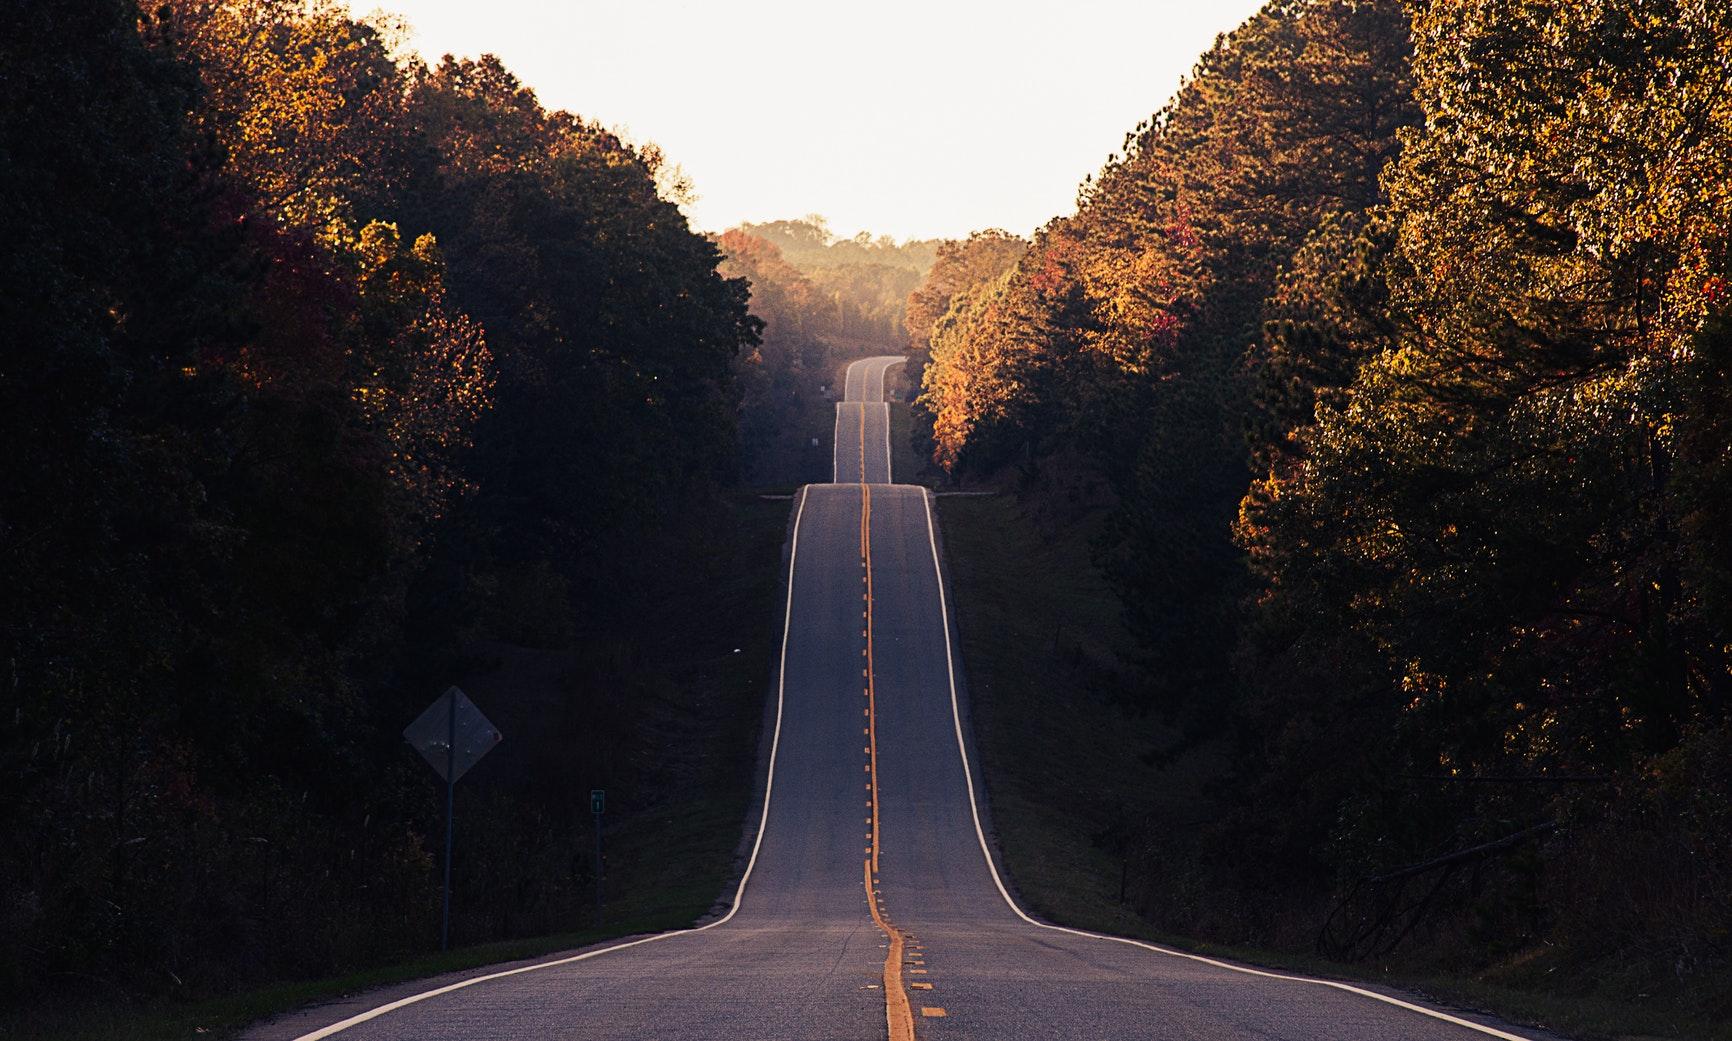 Highway 212 by Matt Duncan